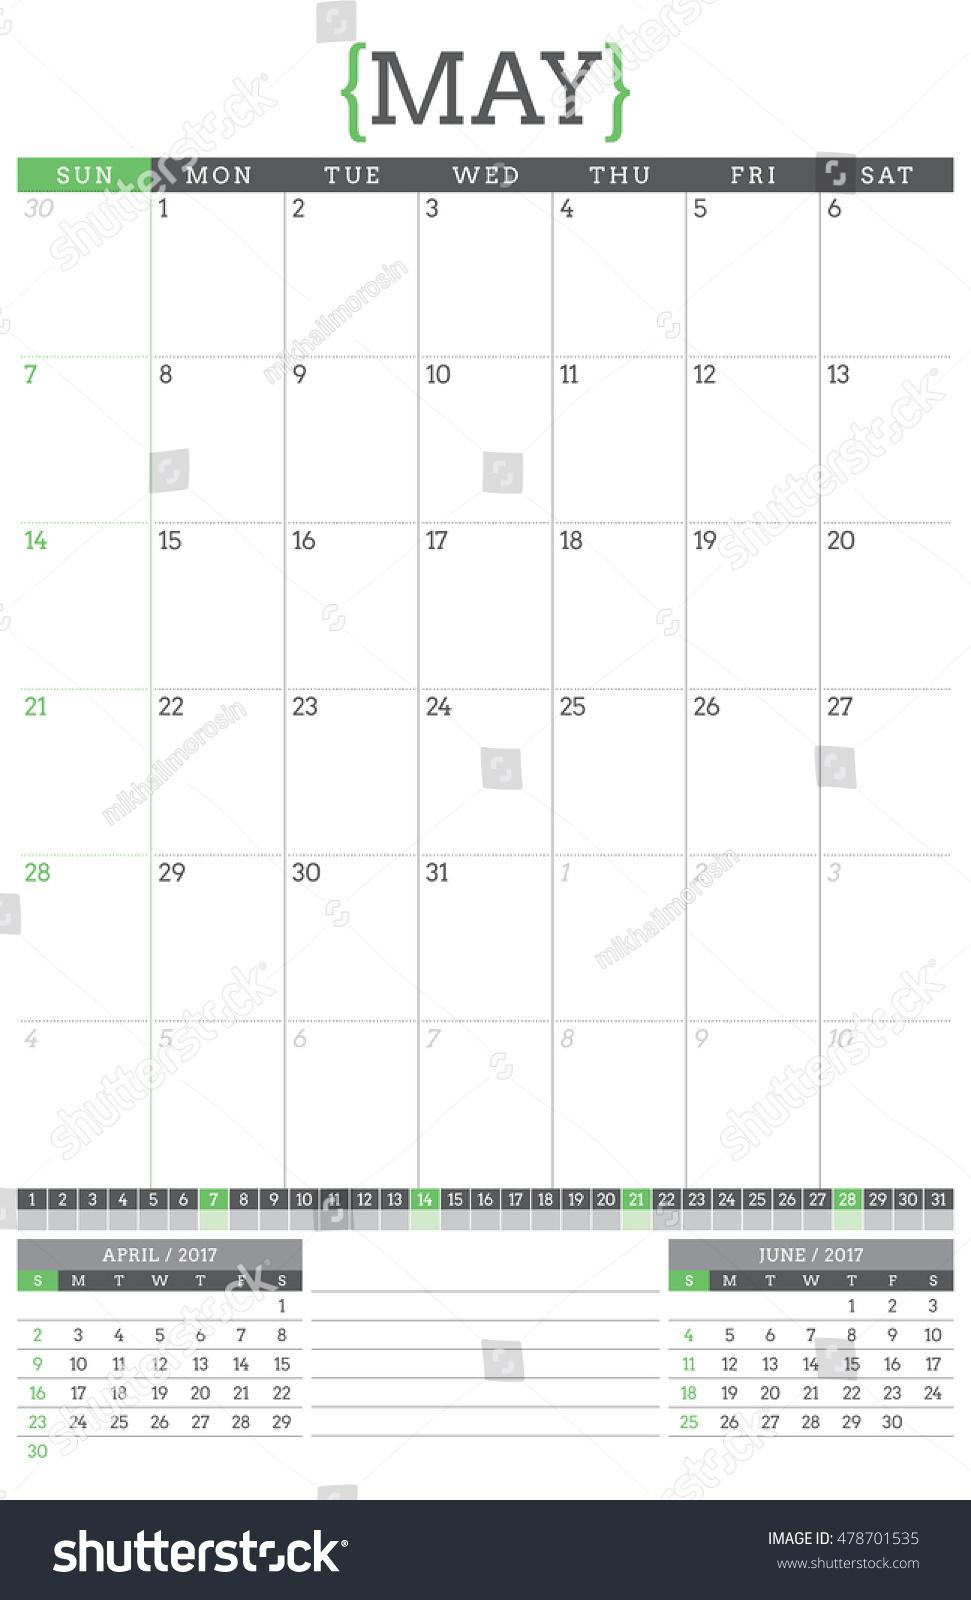 Calendar Planner May : Calendar planner year stationery design stock vector